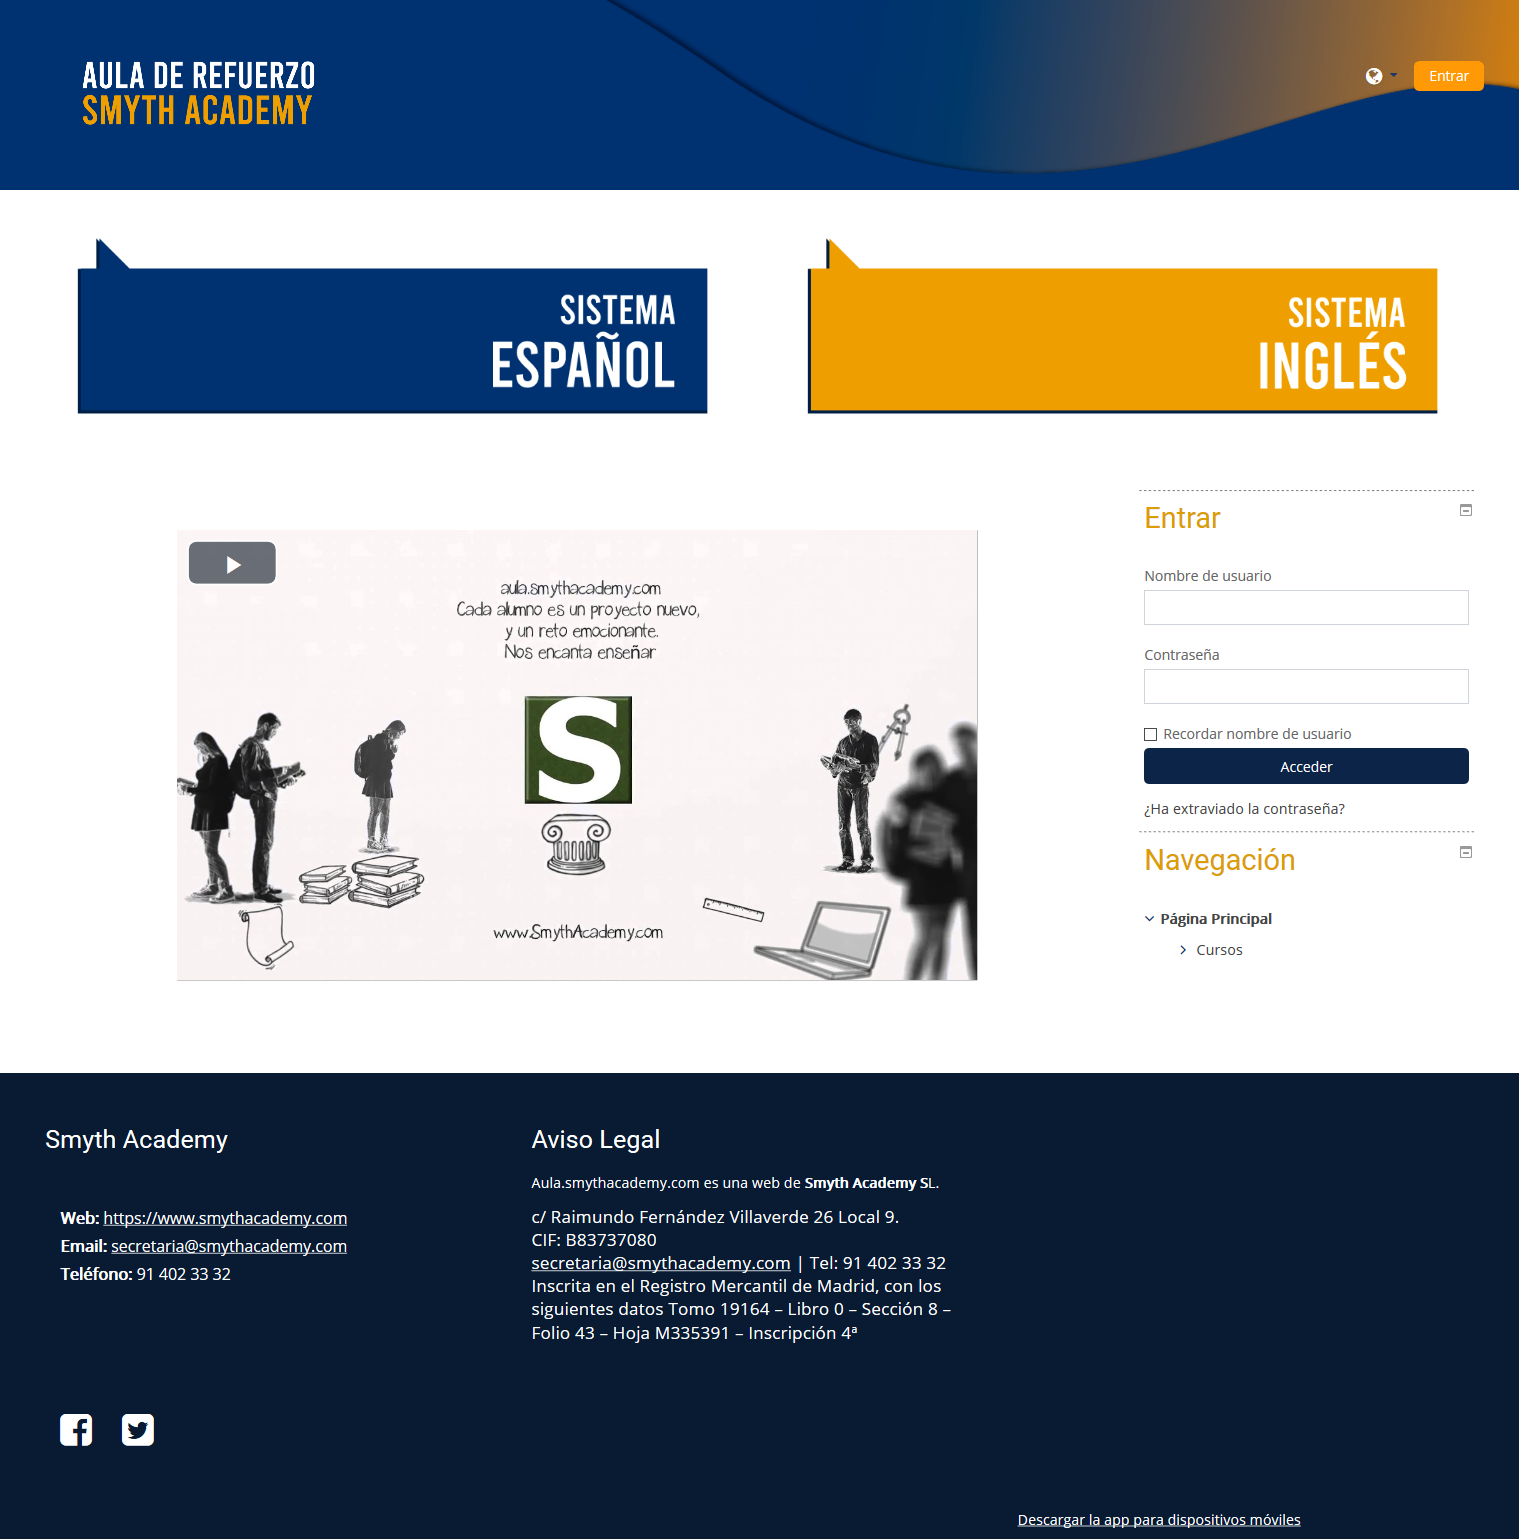 Nuevo Aula Online de Refuerzo.